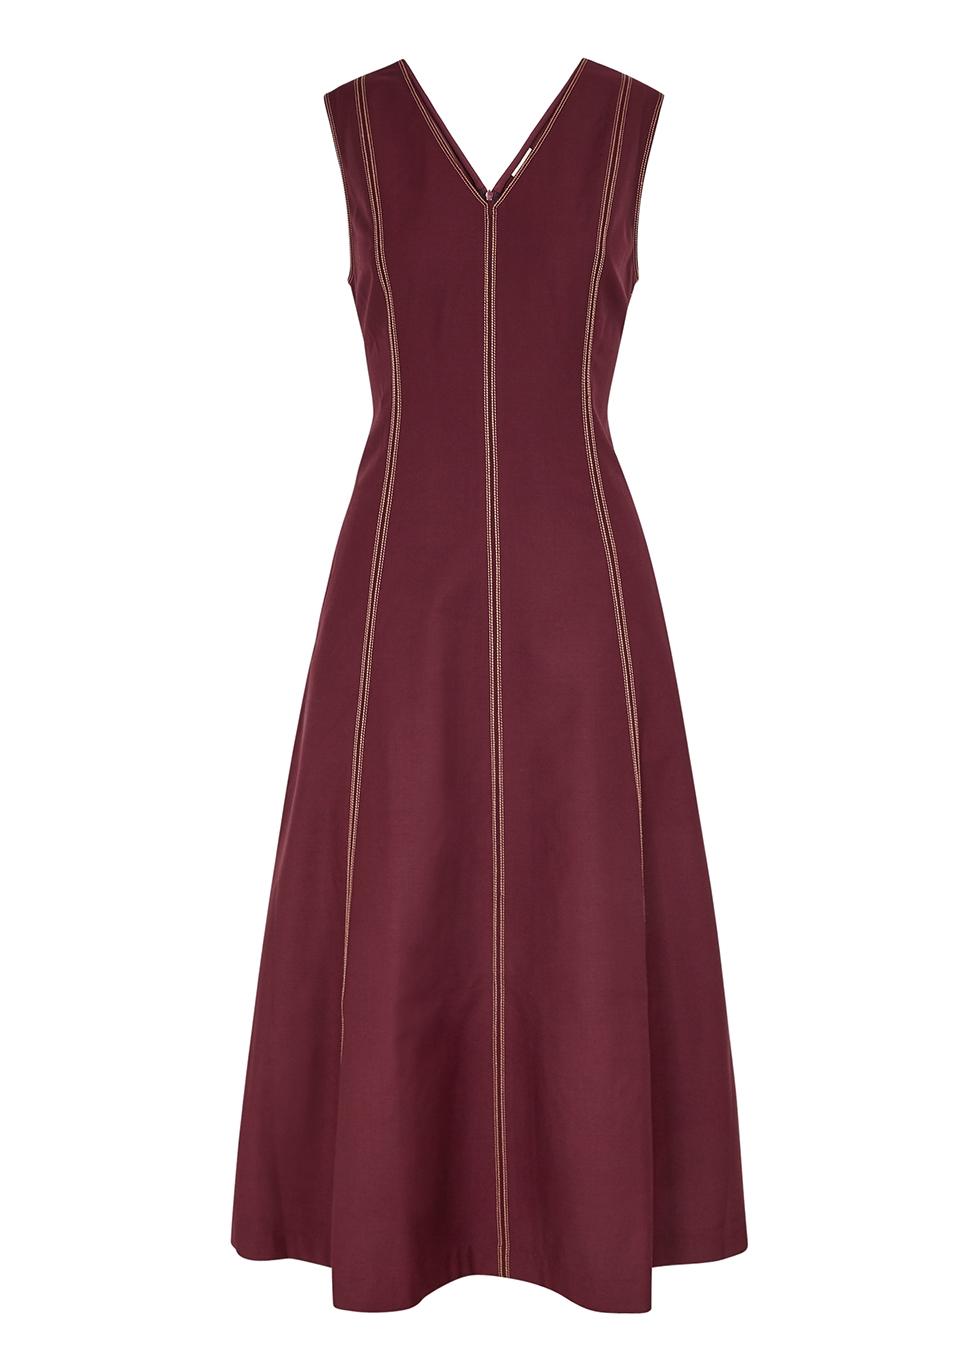 Burgundy panelled midi dress